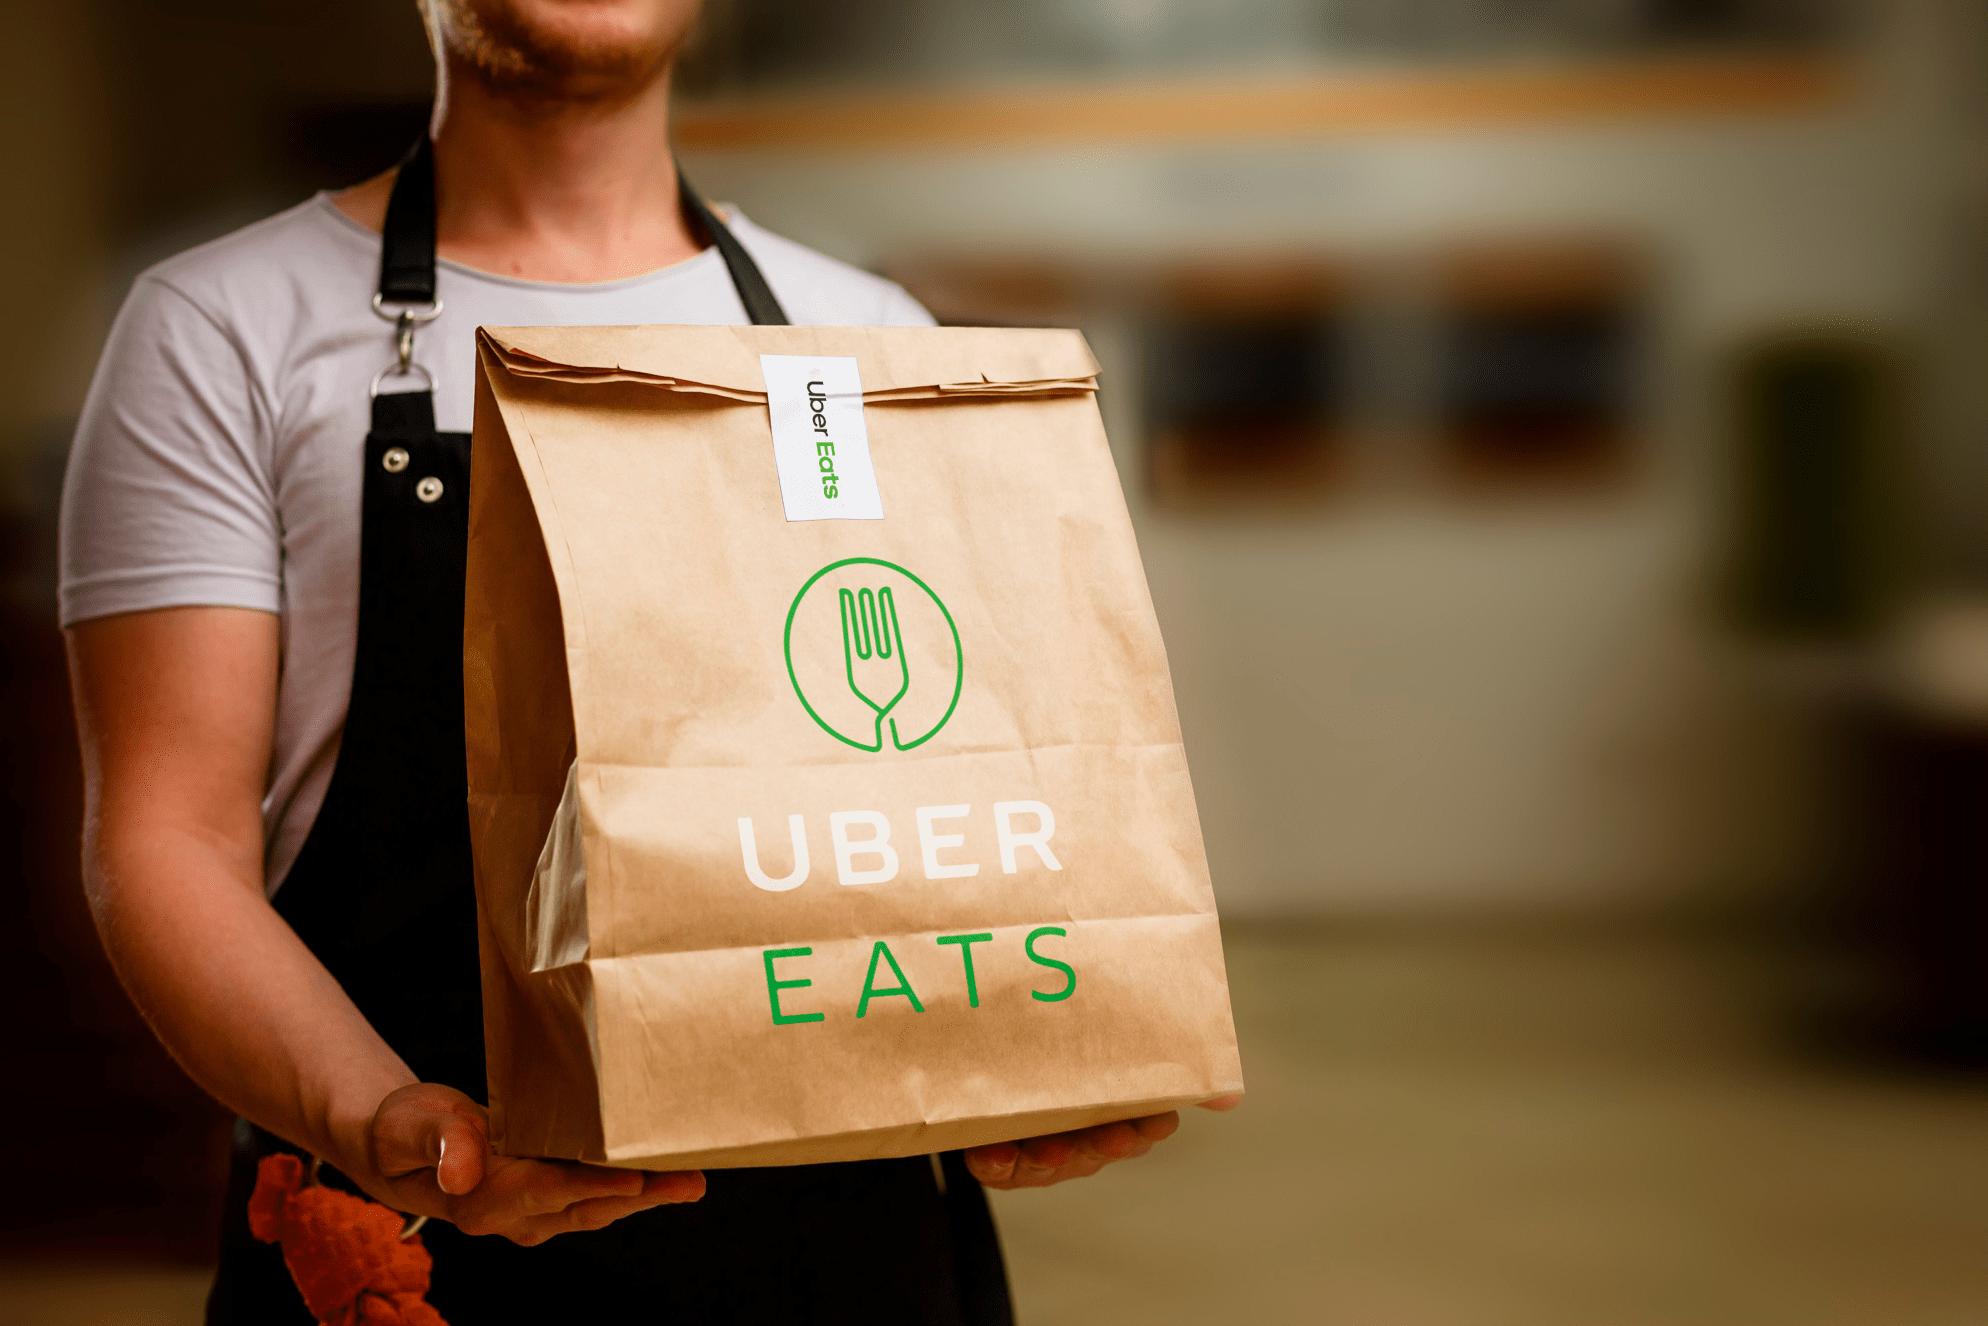 Como o Uber Eats pode aumentar as vendas do seu restaurante?